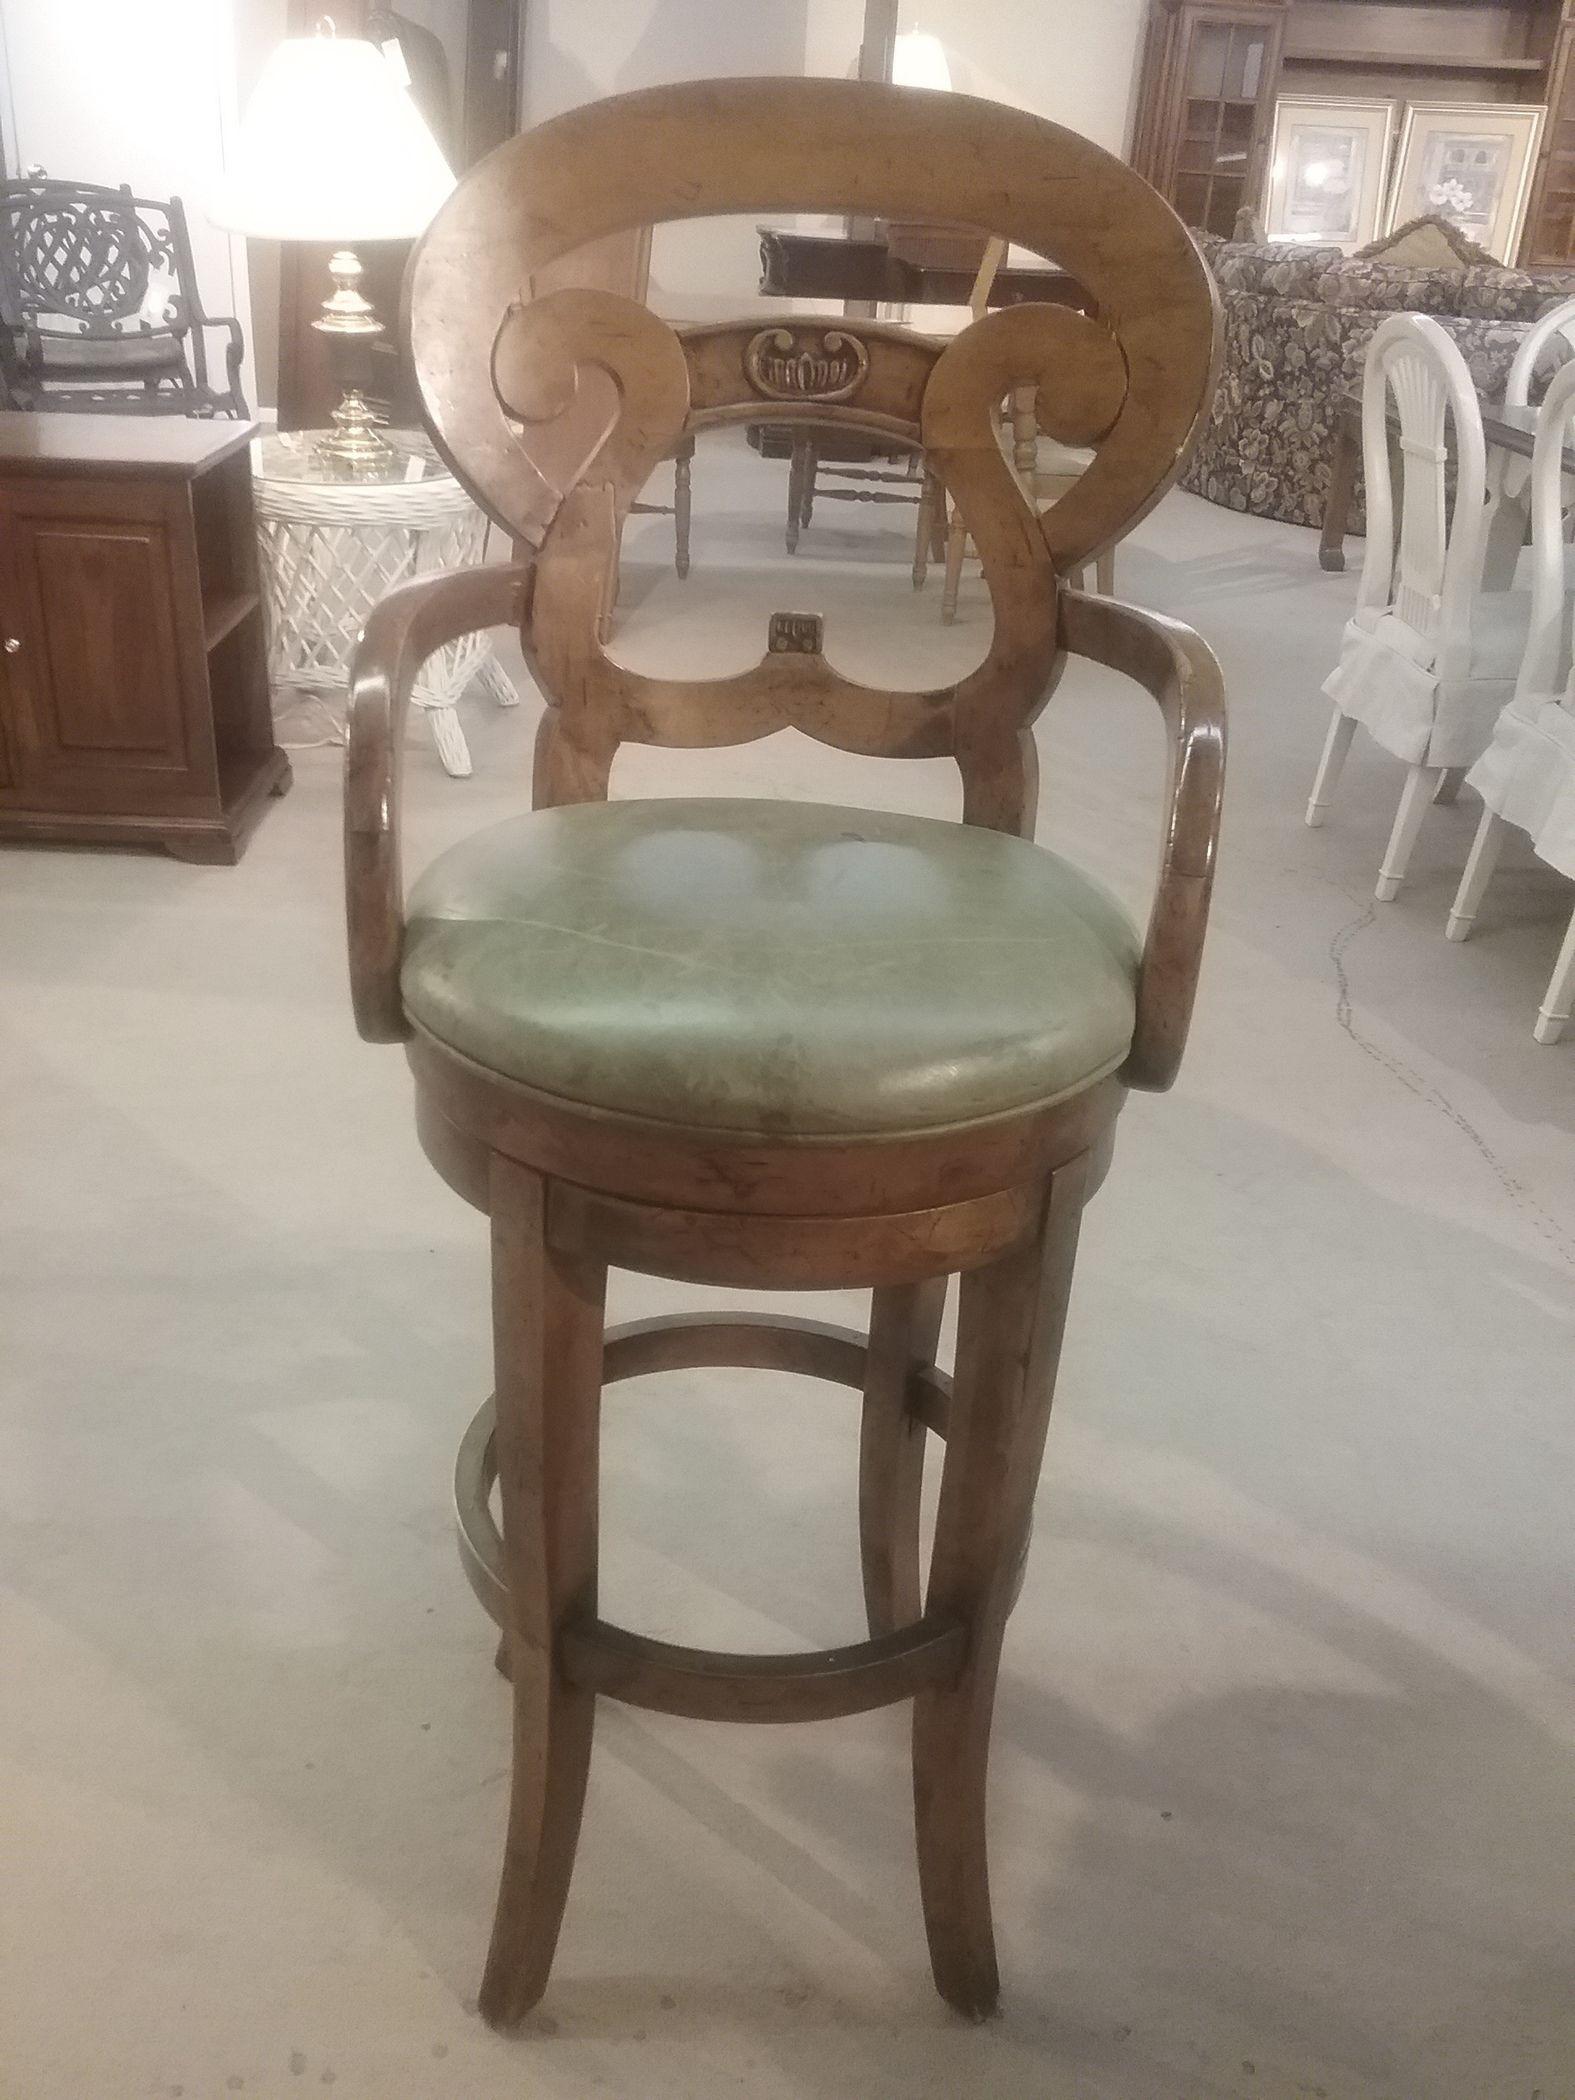 4 Olive Seat Bar Stools Delmarva Furniture Consignment